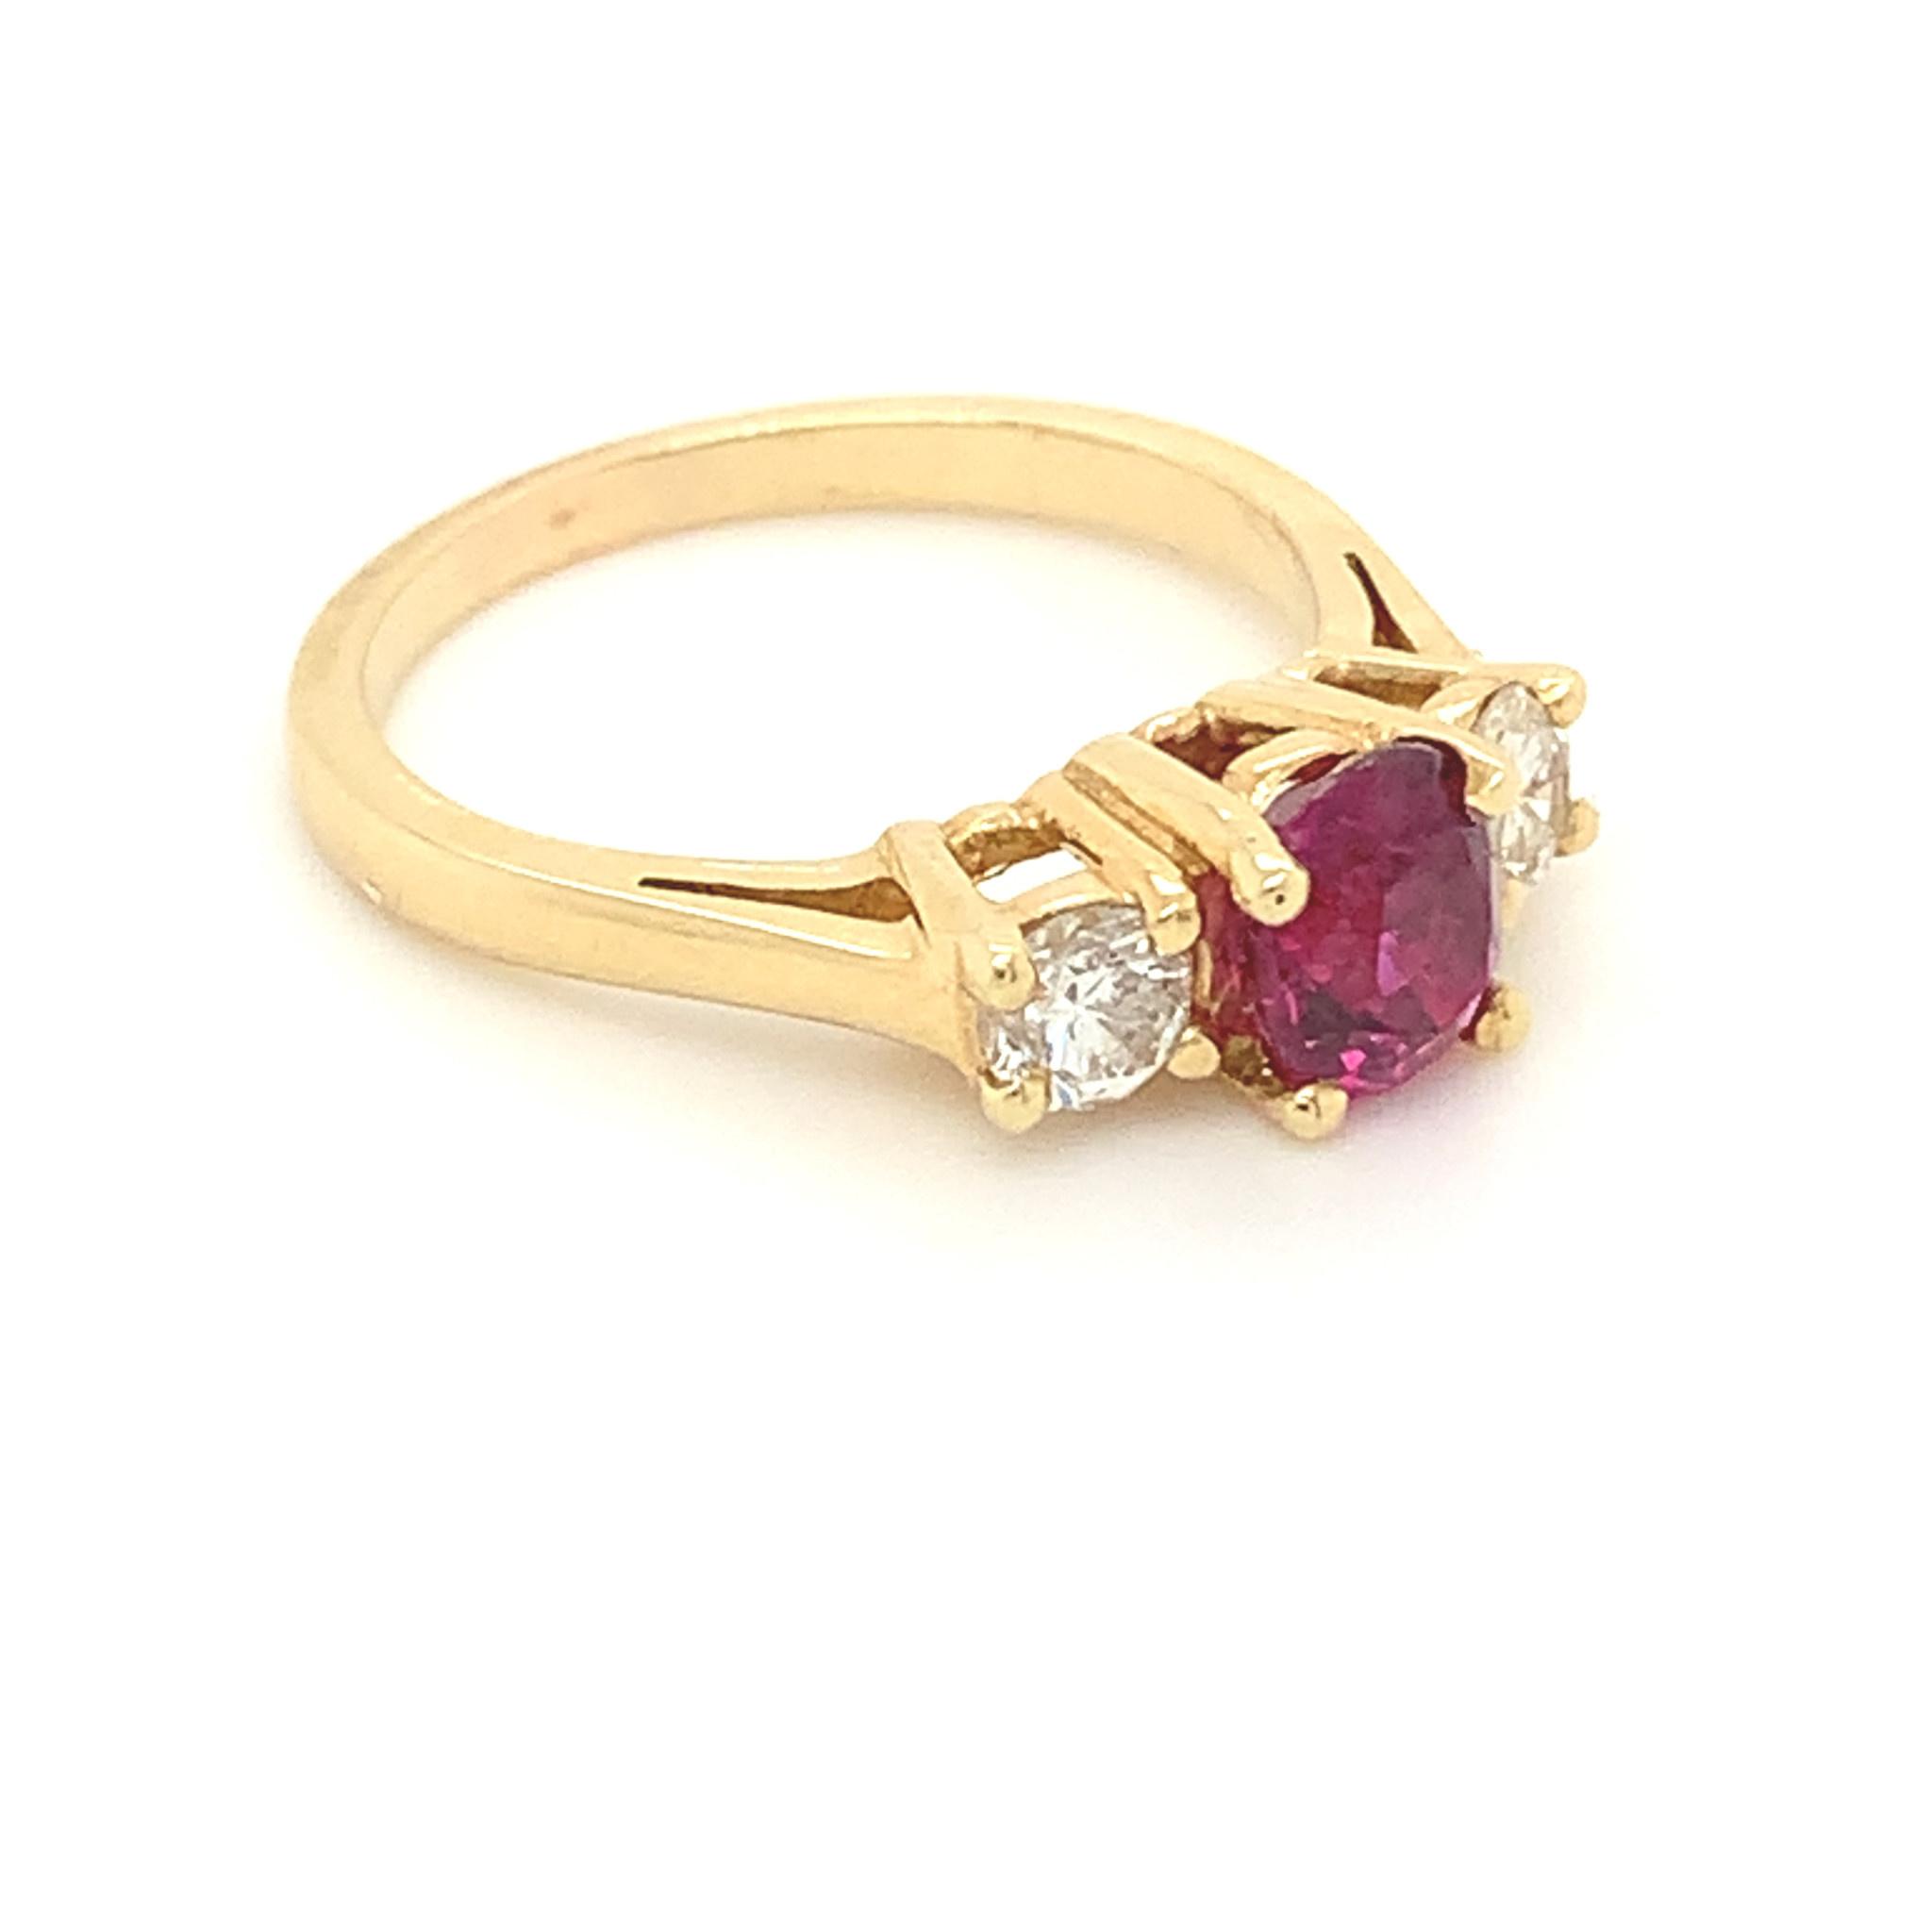 Freedman 14kt yellow gold 3-stone Ruby & Diamond Ring